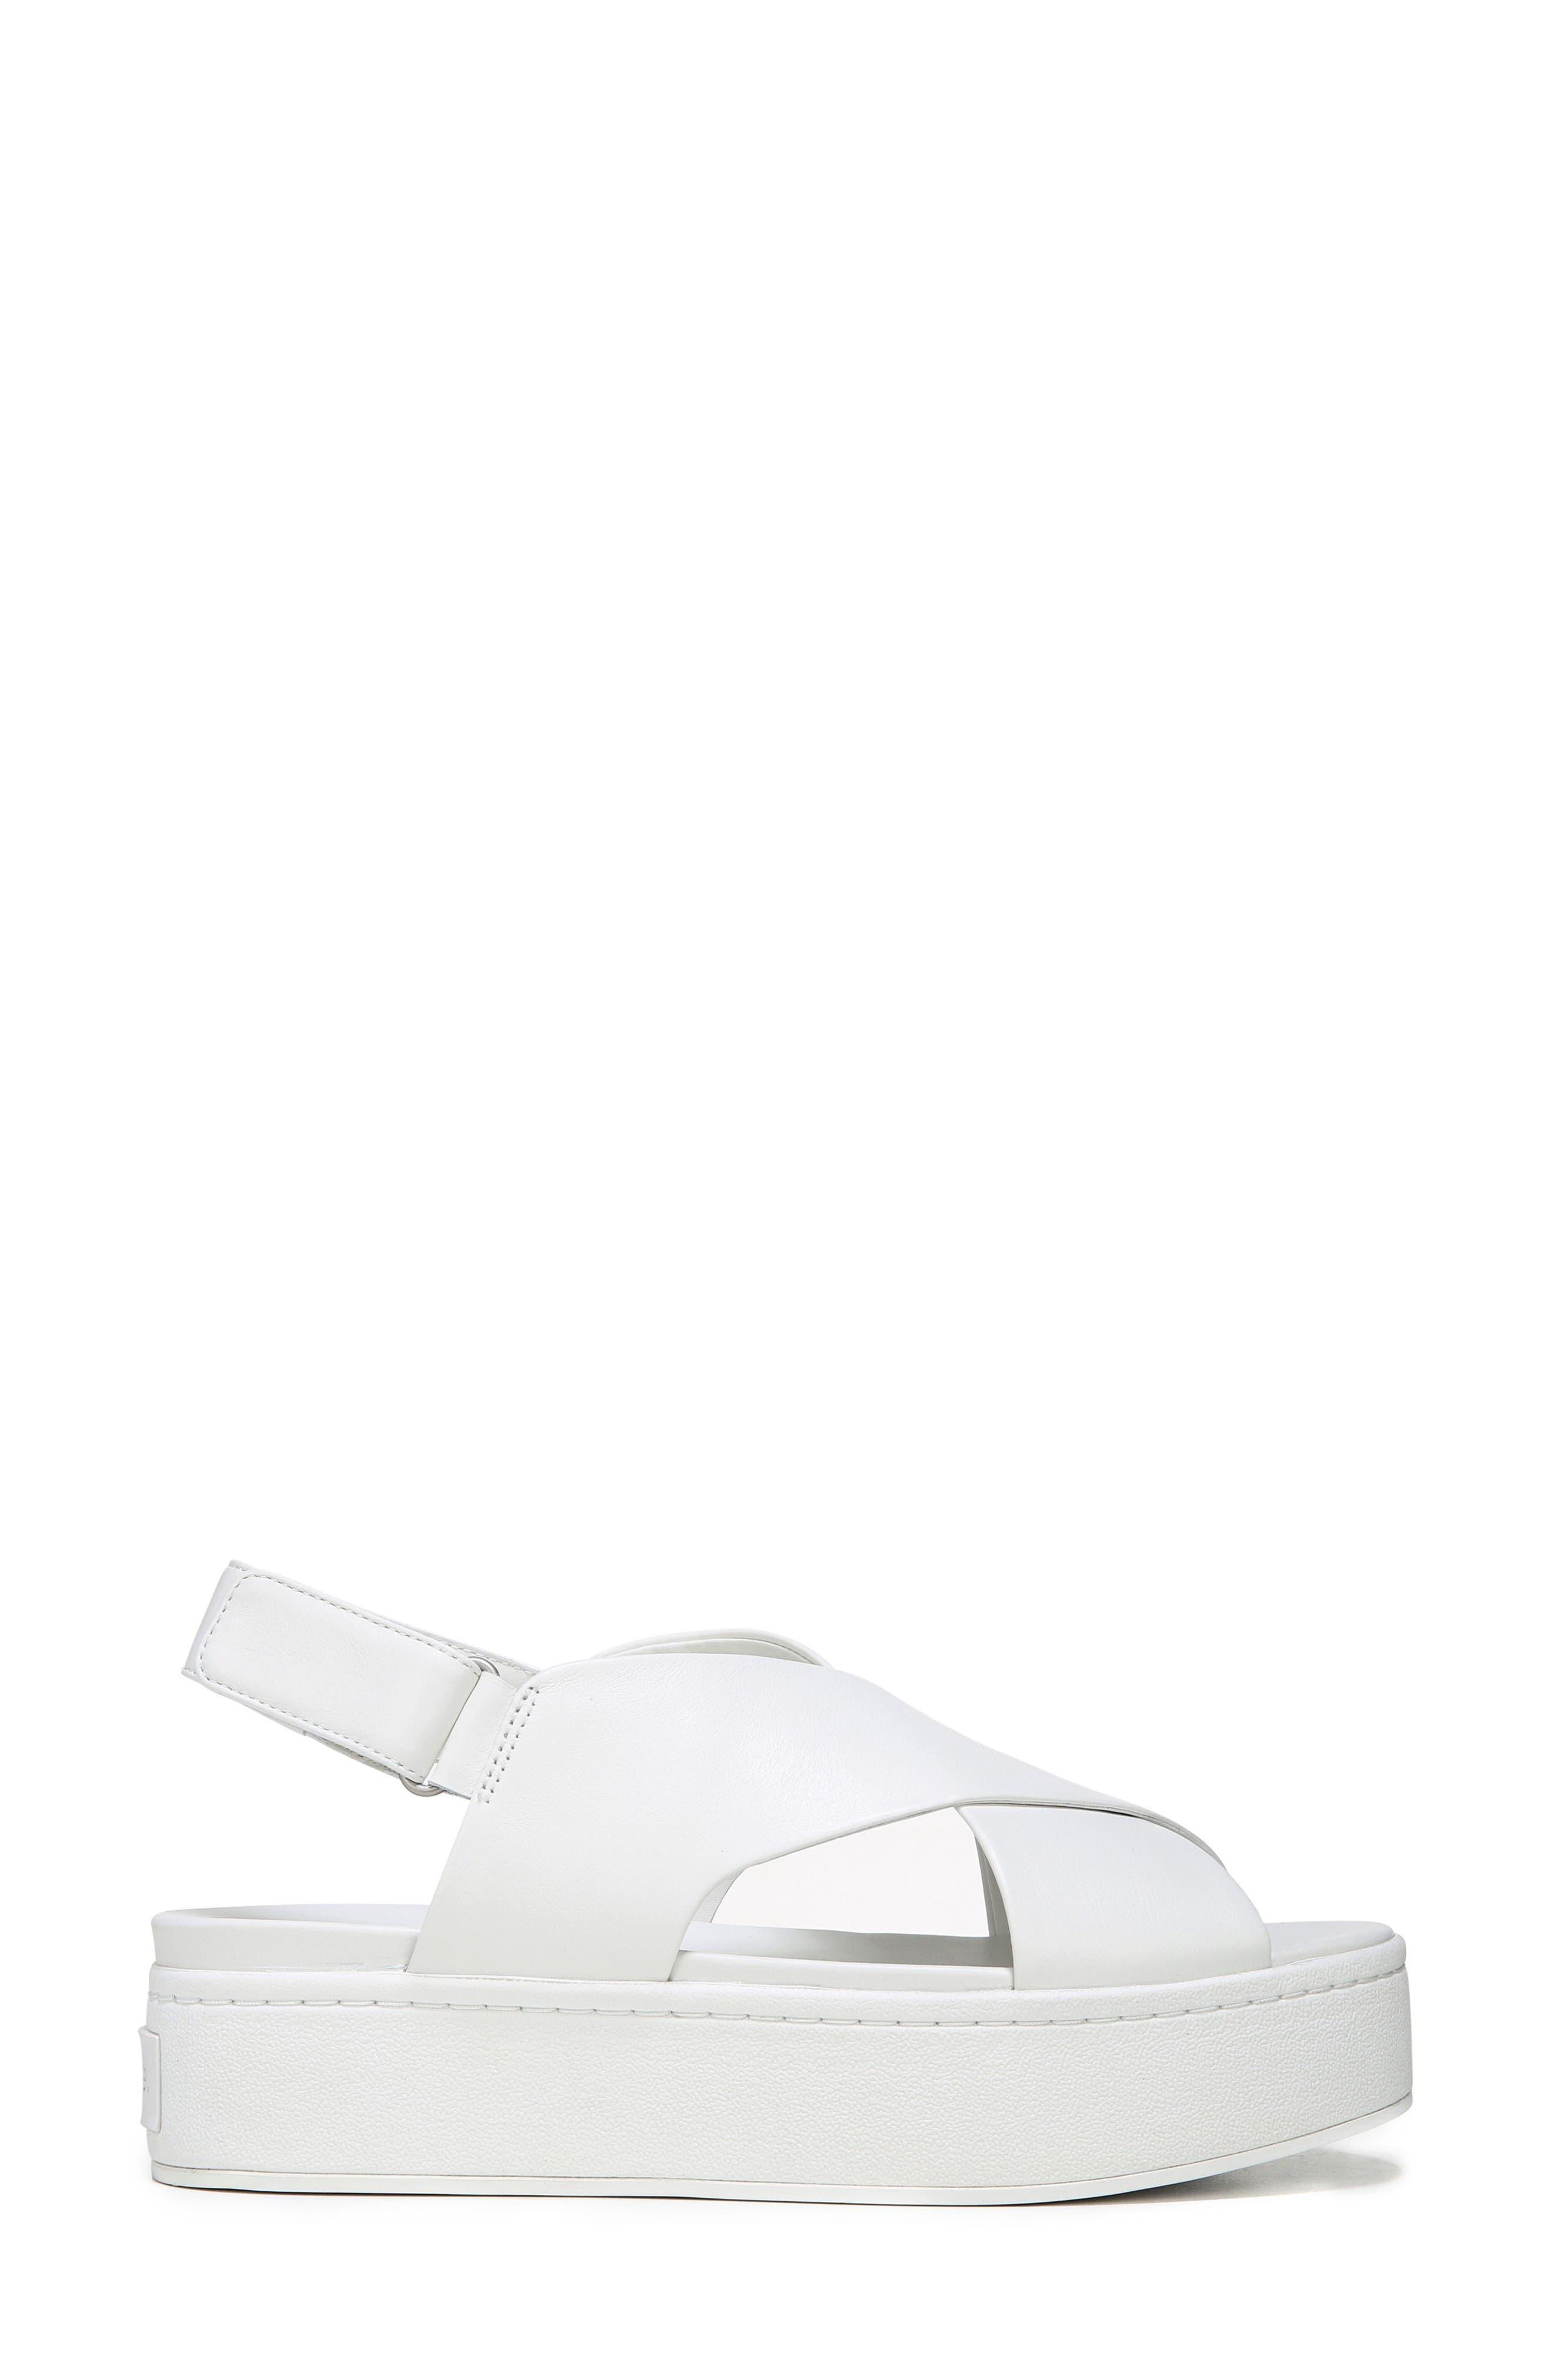 Weslan Cross Strap Slingback Sandal,                             Alternate thumbnail 3, color,                             Horchata